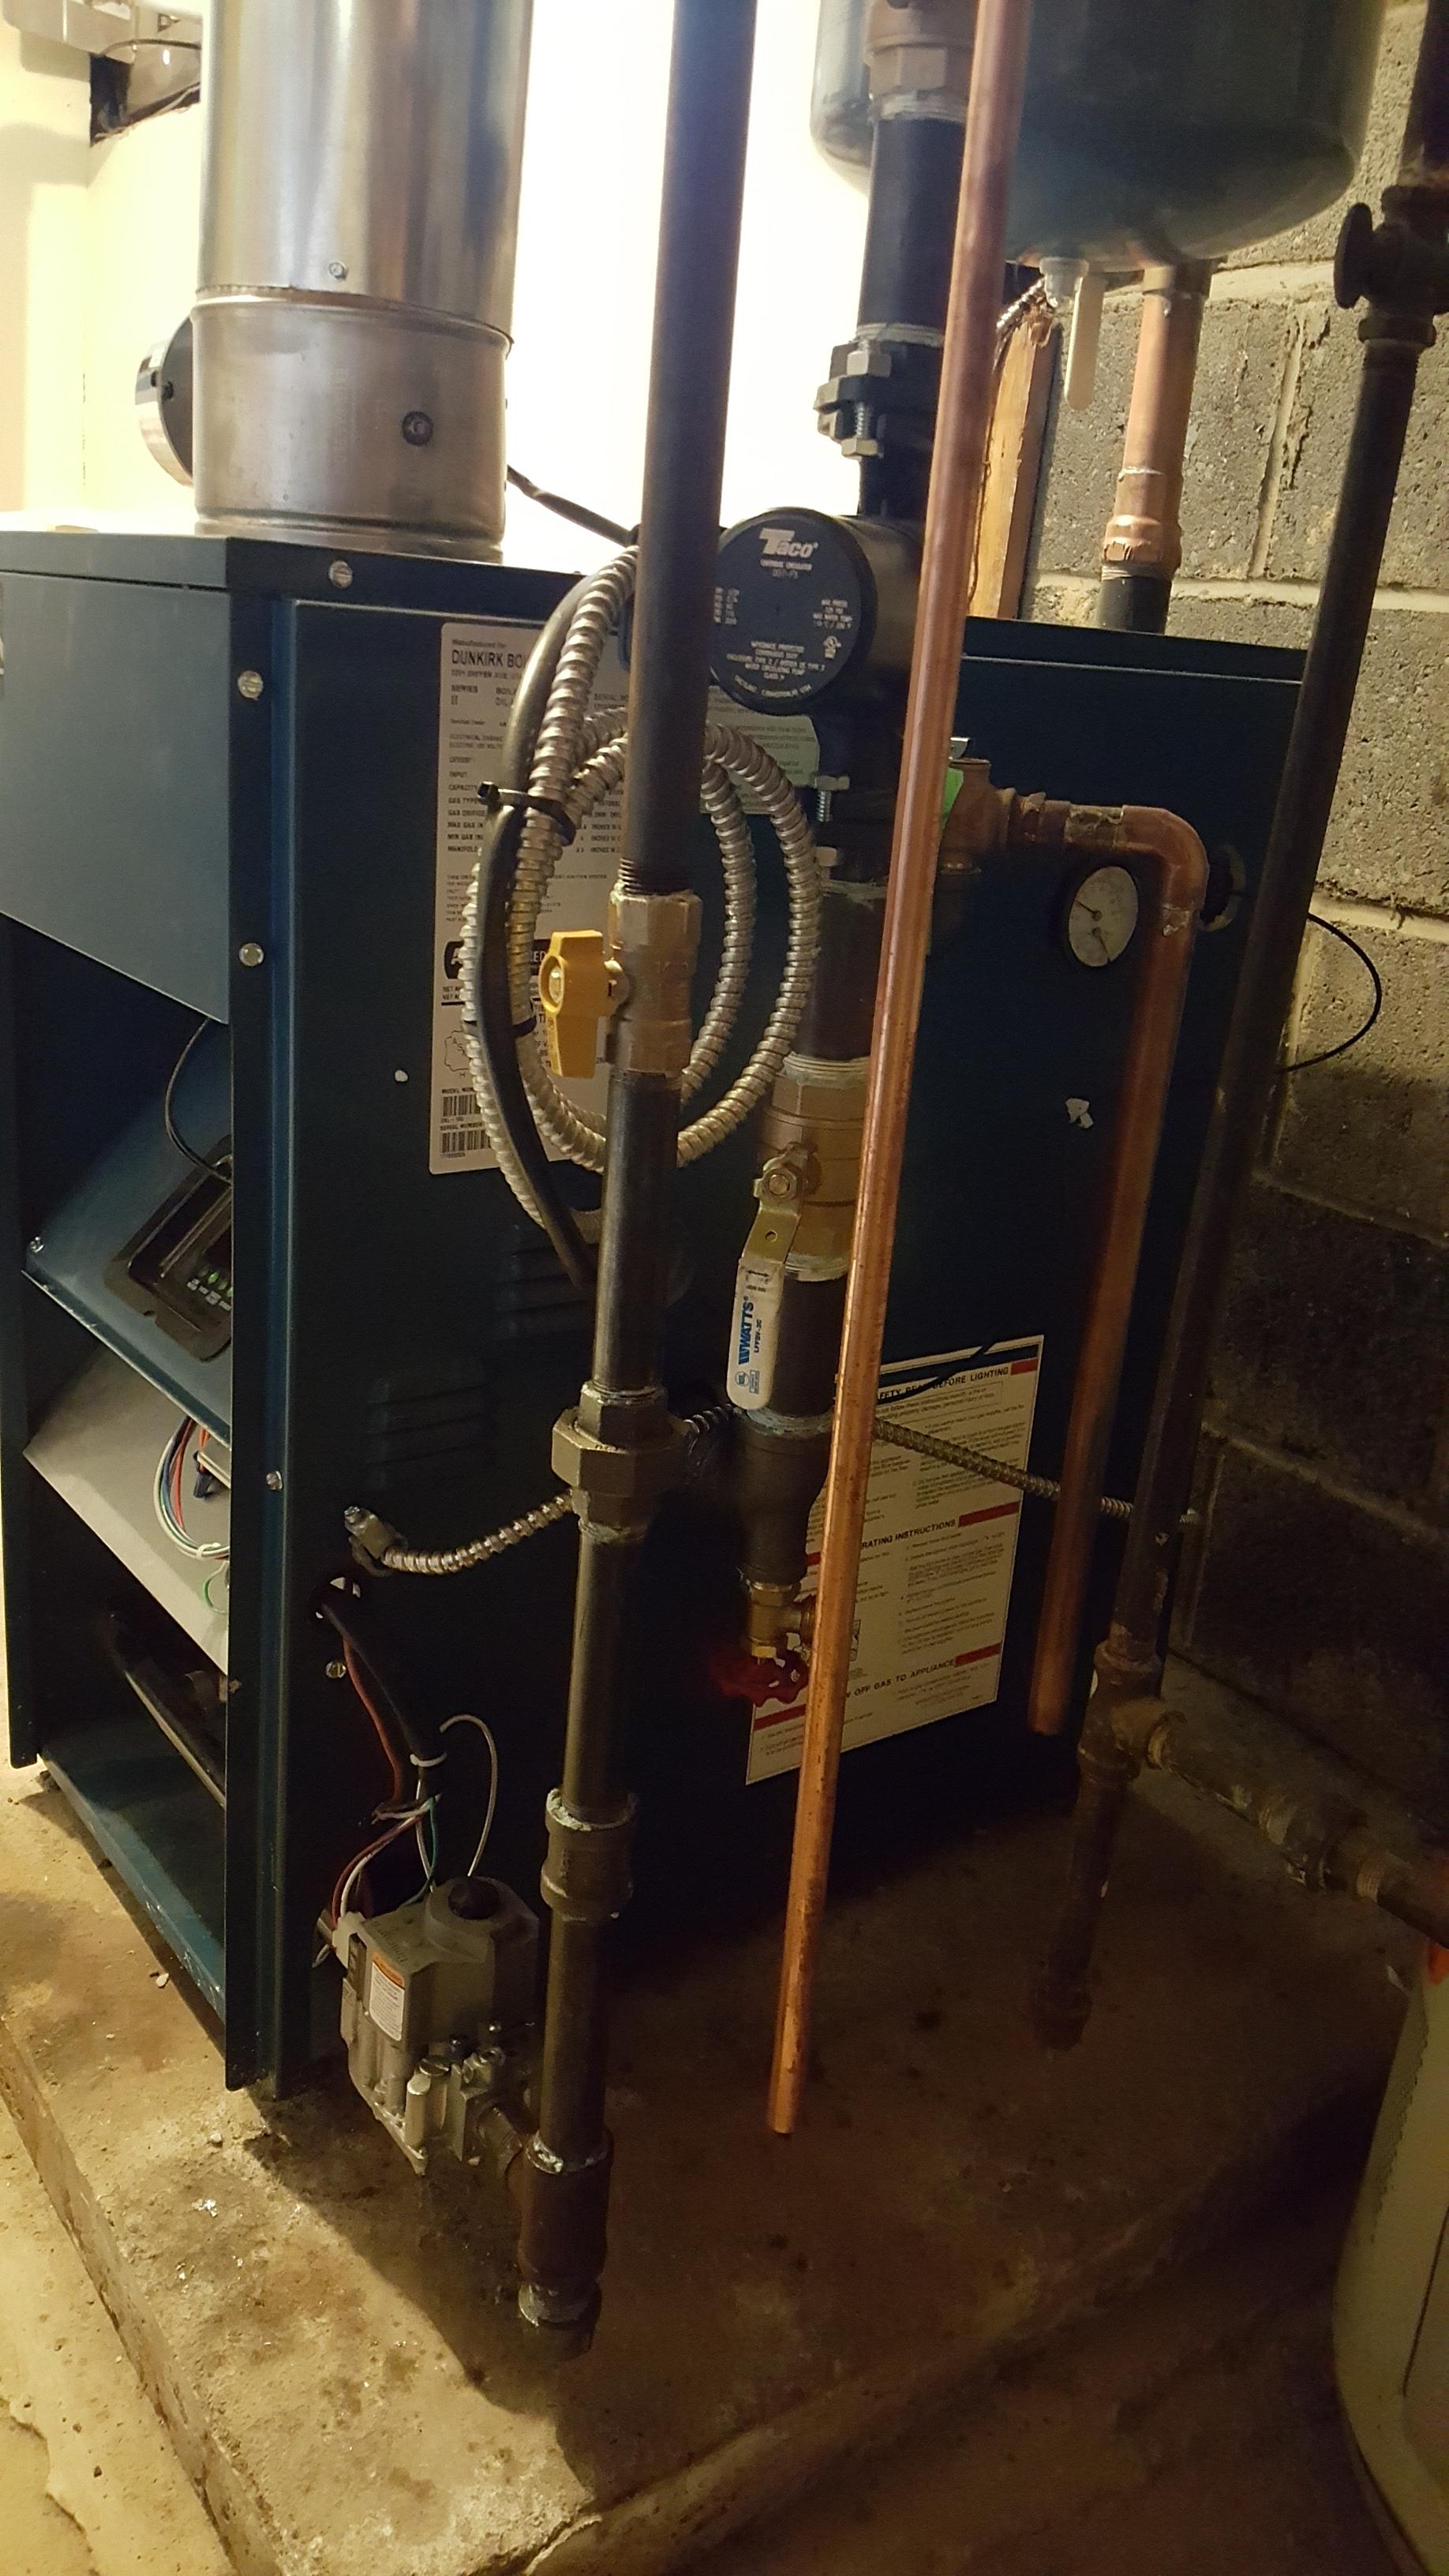 New boiler, rollout switch keeps breaking — Heating Help